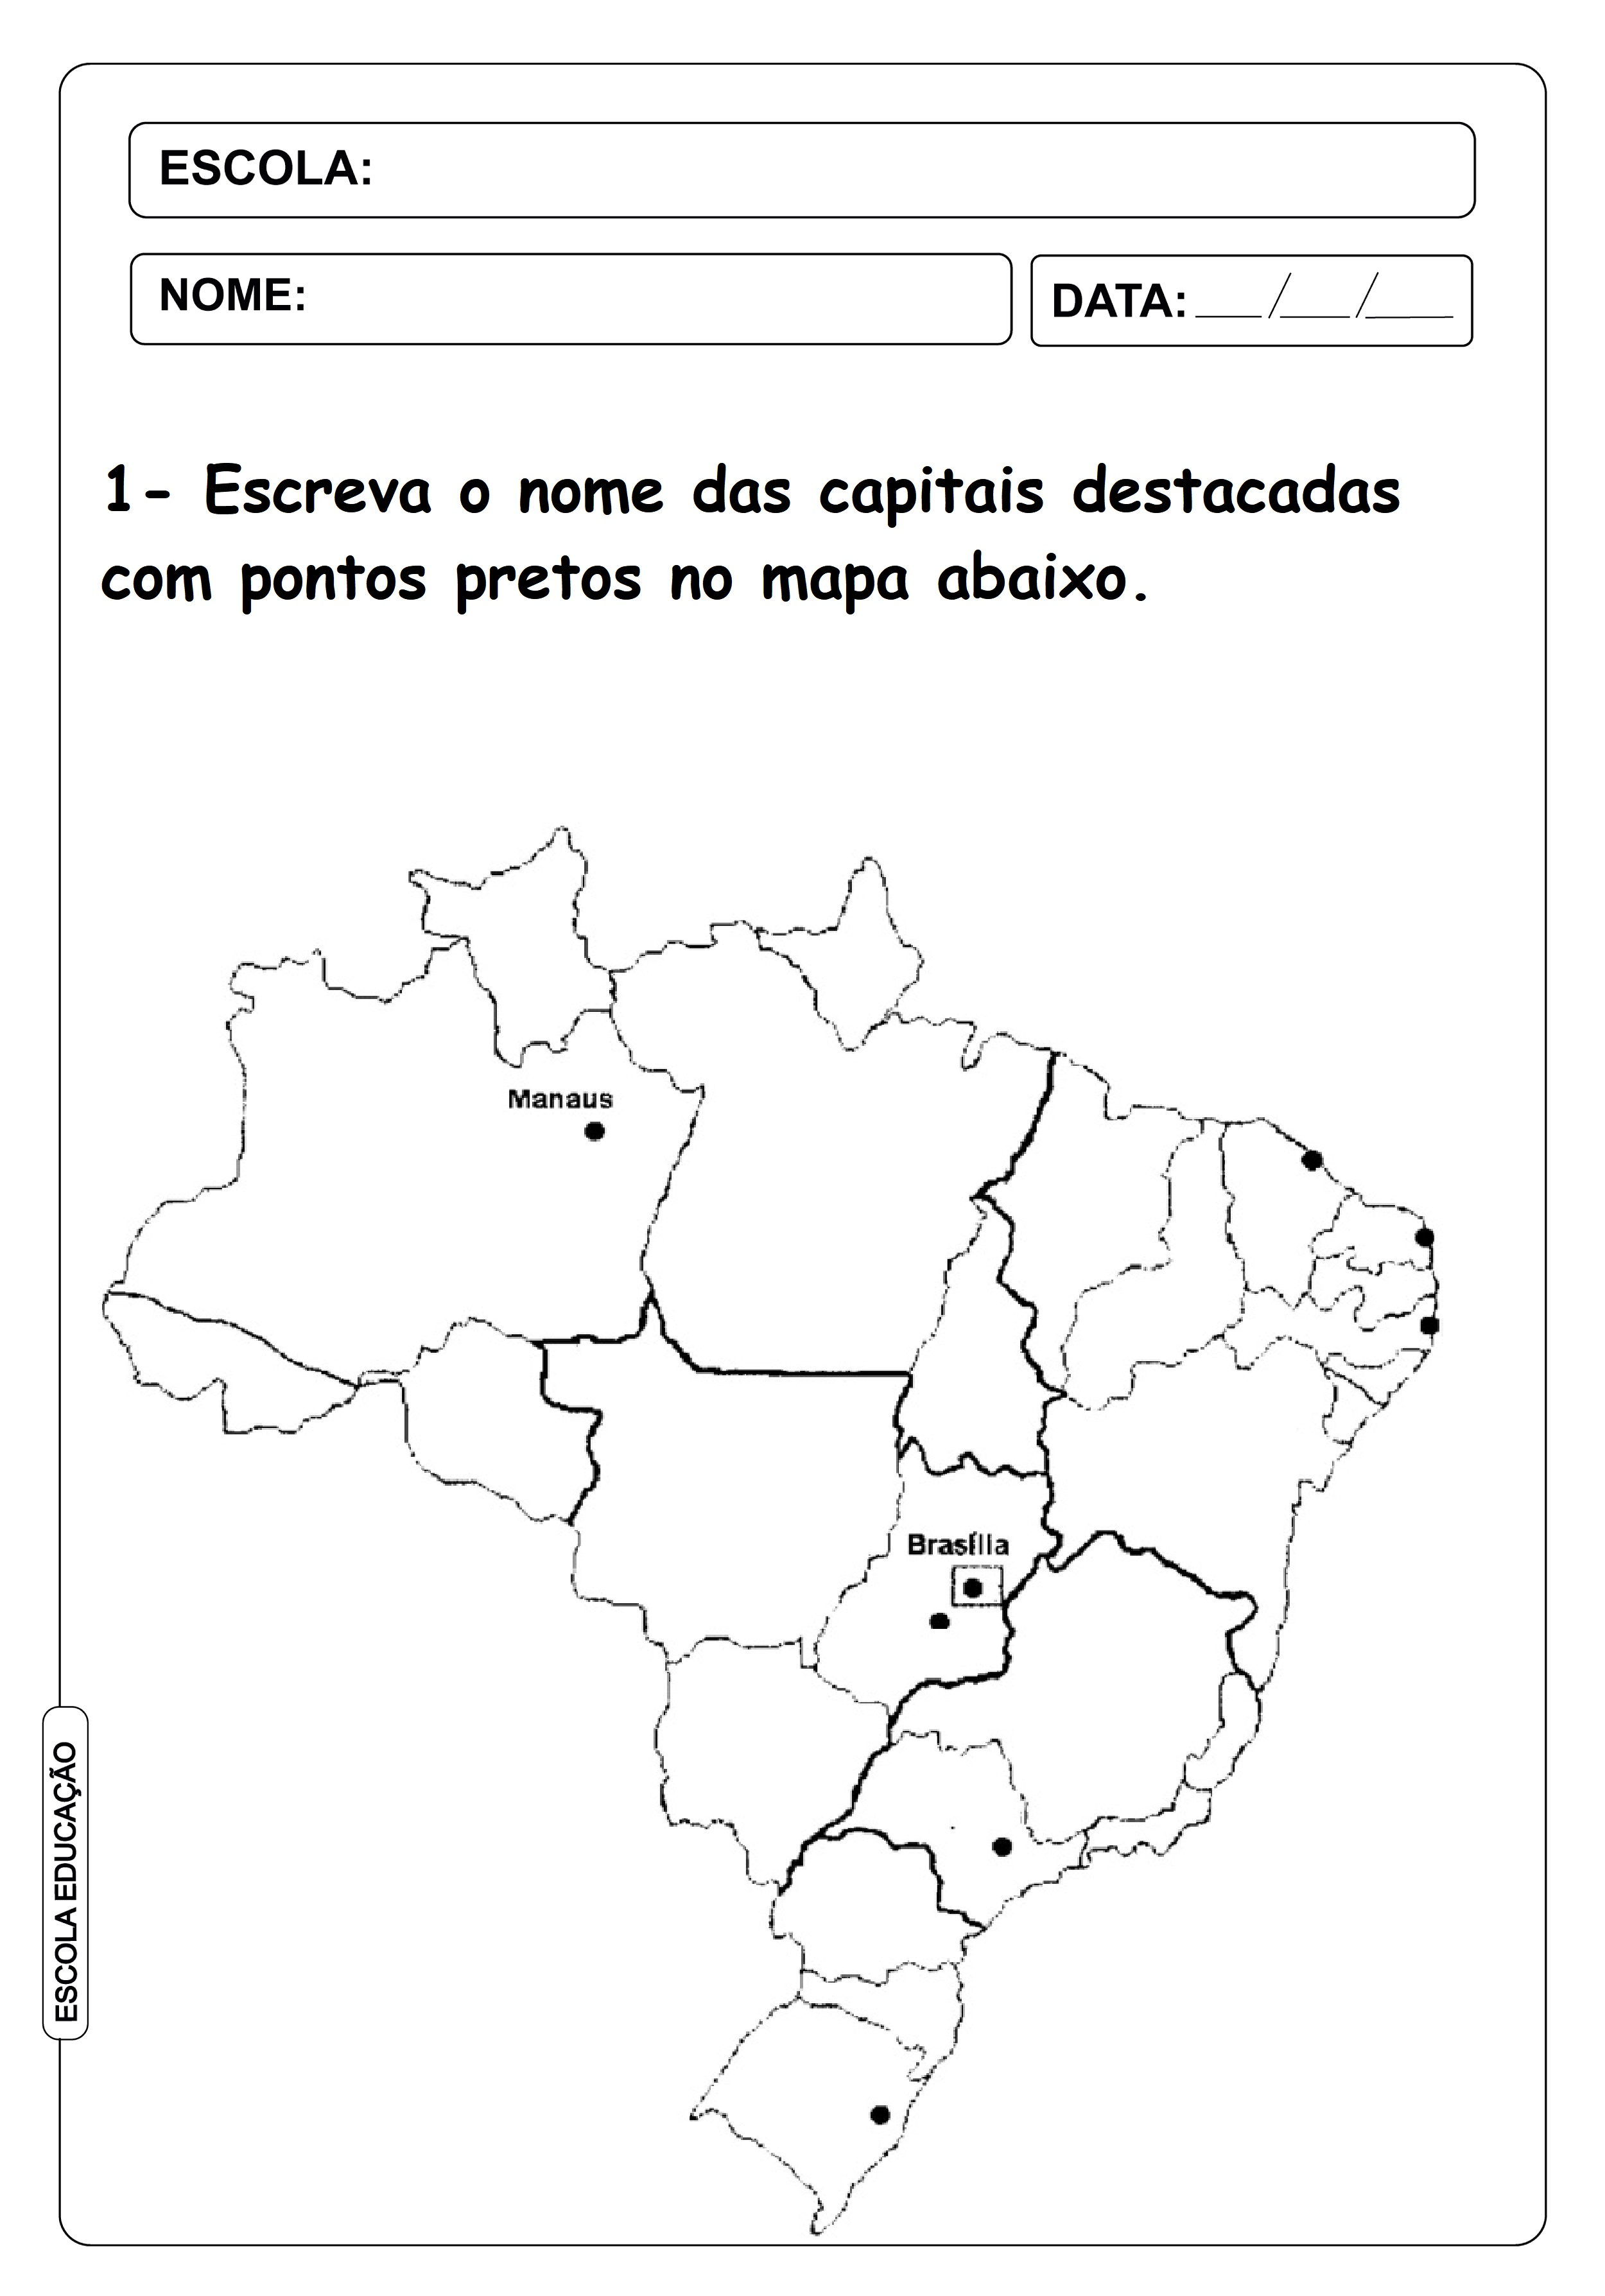 6 Mapas Do Brasil Para Colorir E Imprimir Escola Educacao